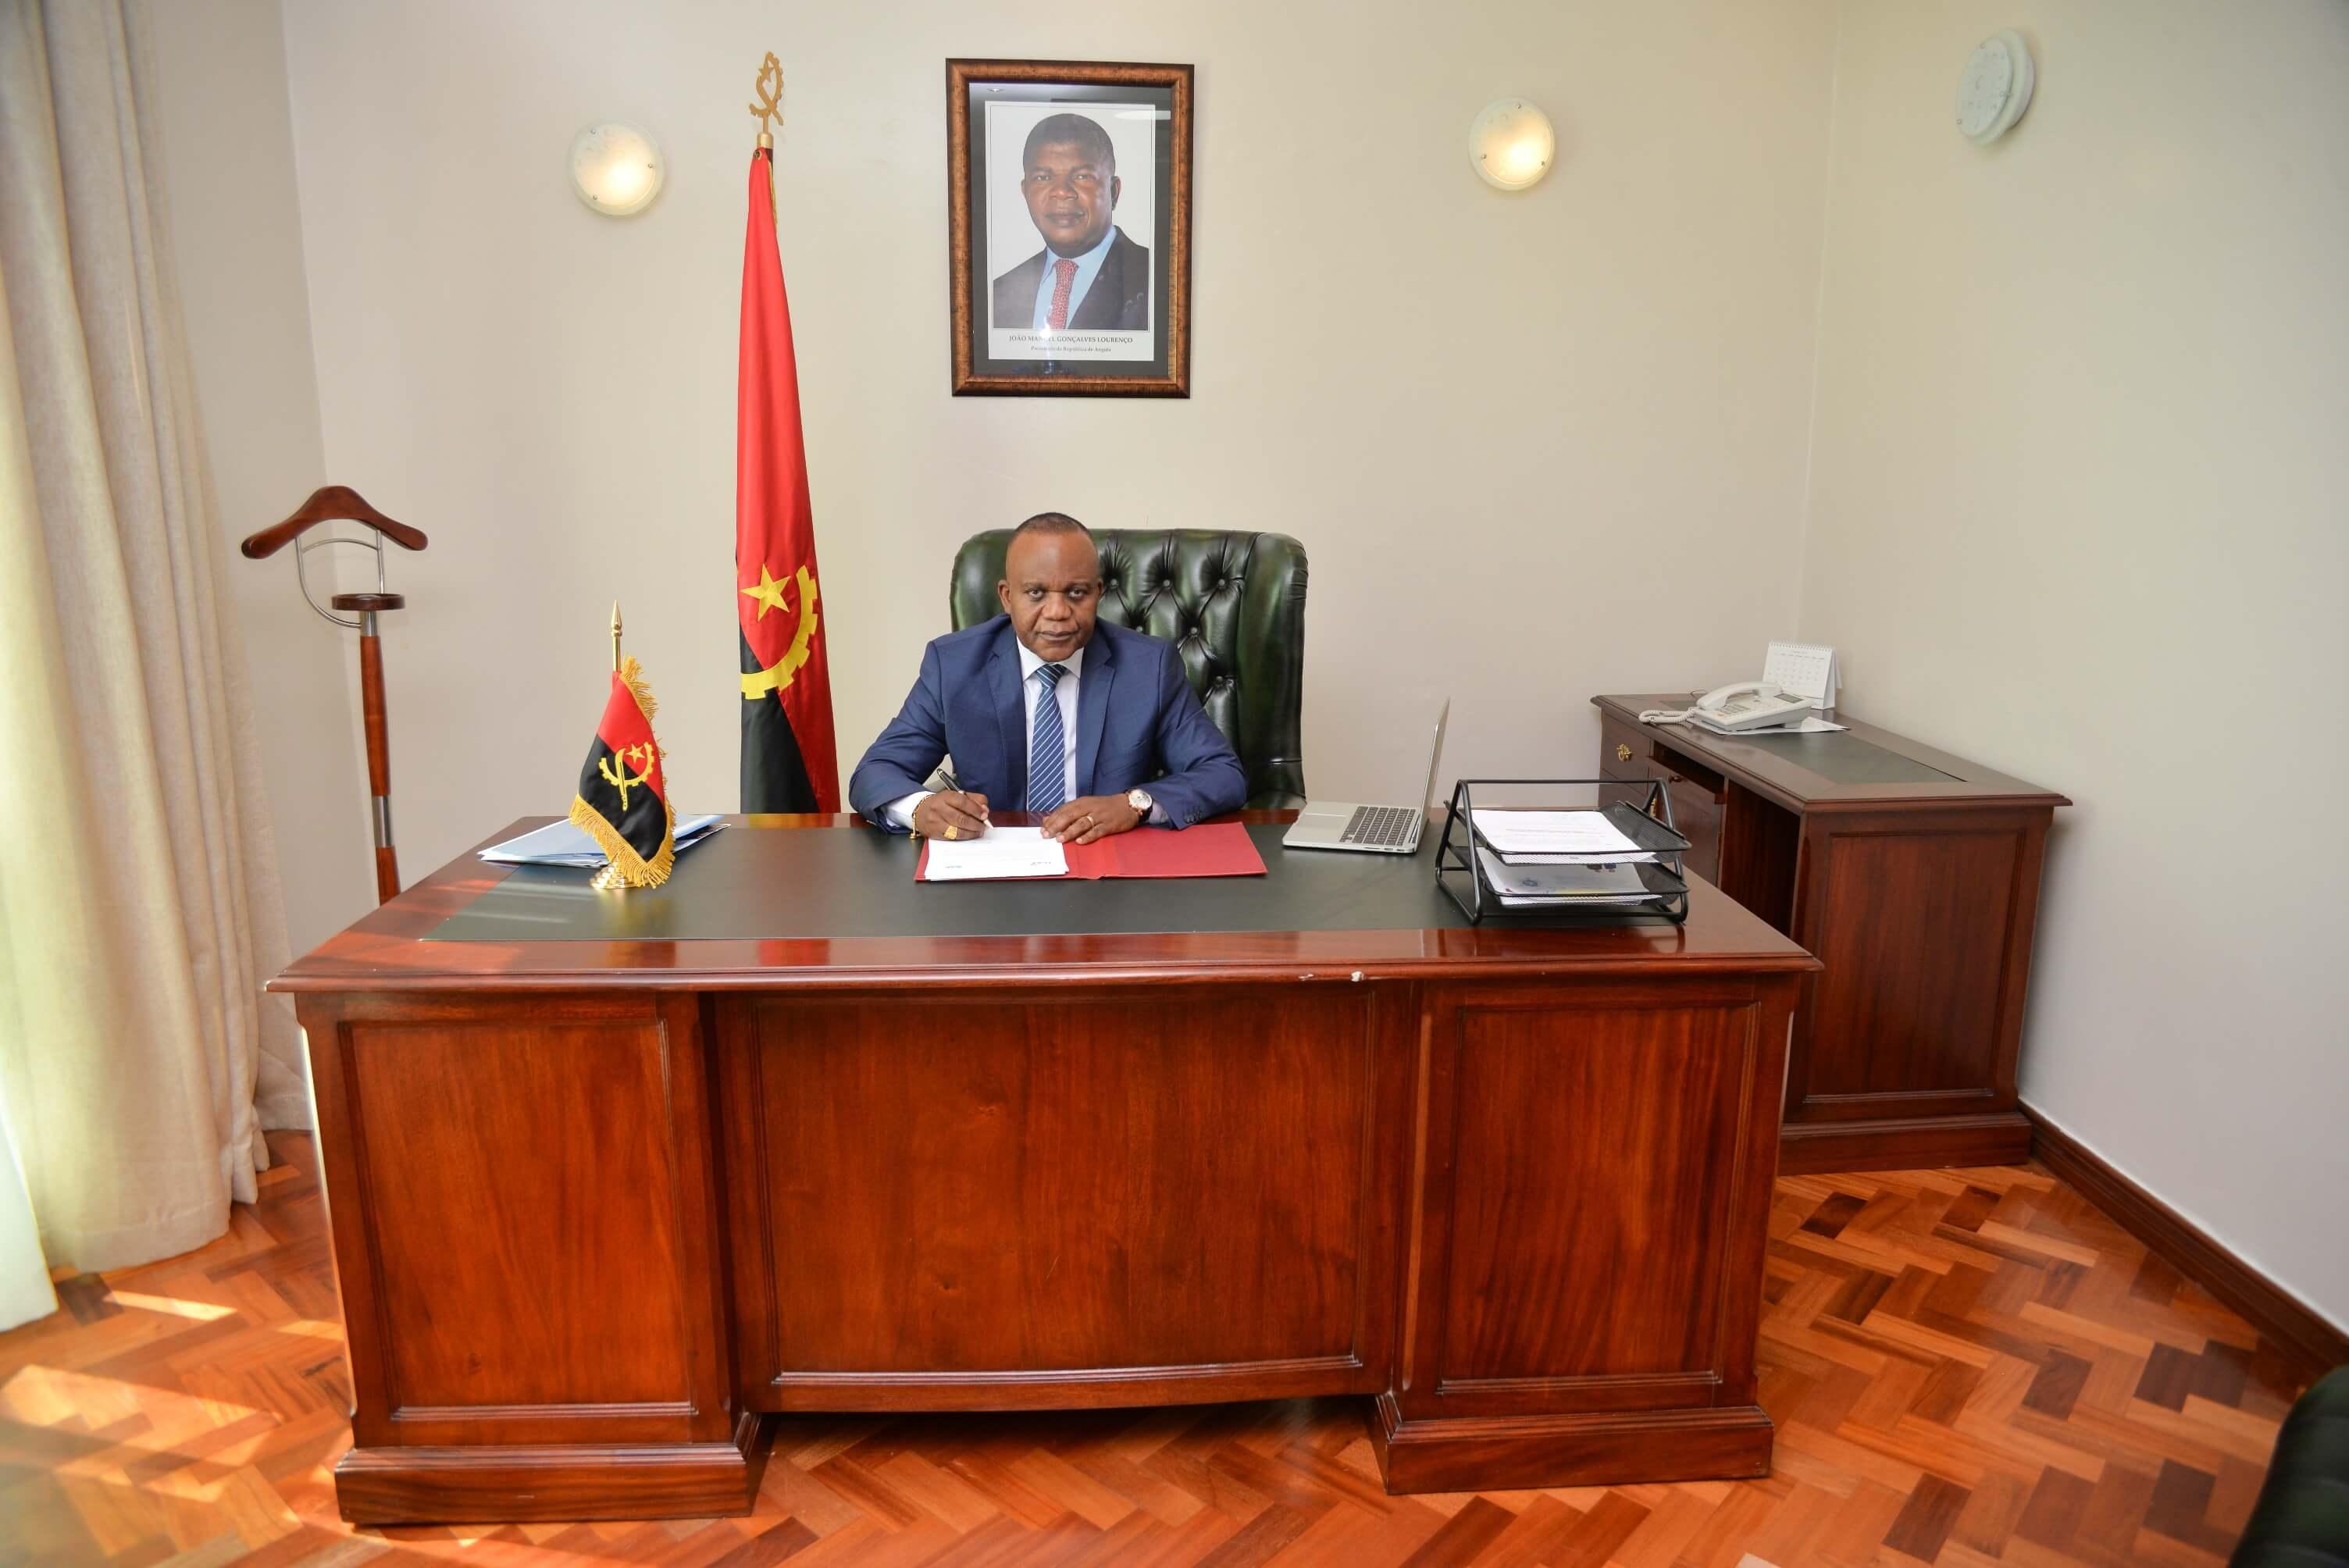 Embassy Of The Republic Of Angola In Kenya